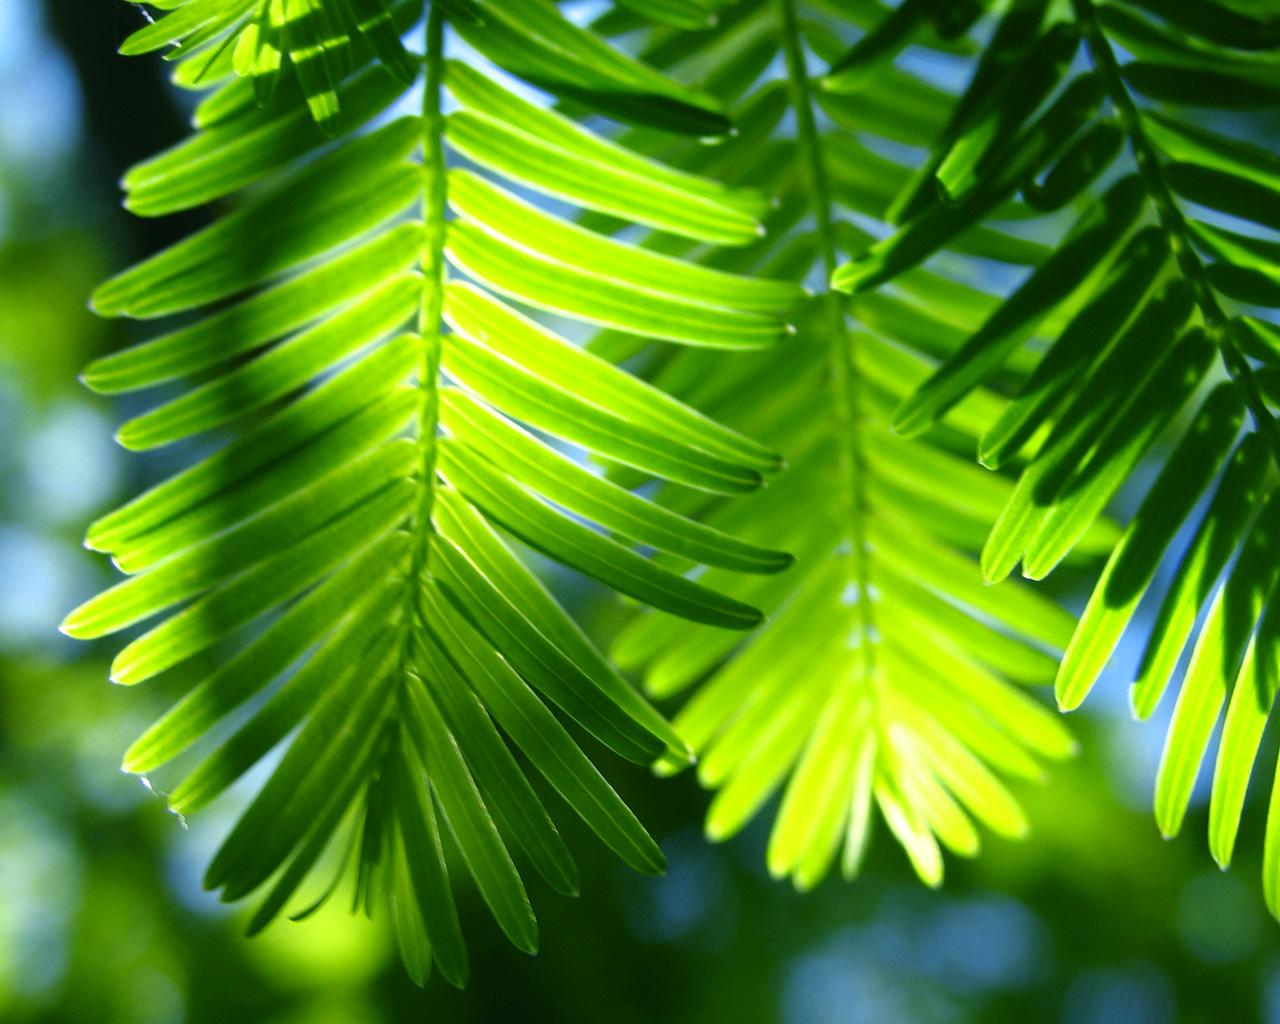 http://1.bp.blogspot.com/-uaWTvJQJx_8/Tee8jPVsz6I/AAAAAAAAAJg/0V9HoGjIY58/s1600/nature_wallpaper_tropicalparadise1280x1024.jpg